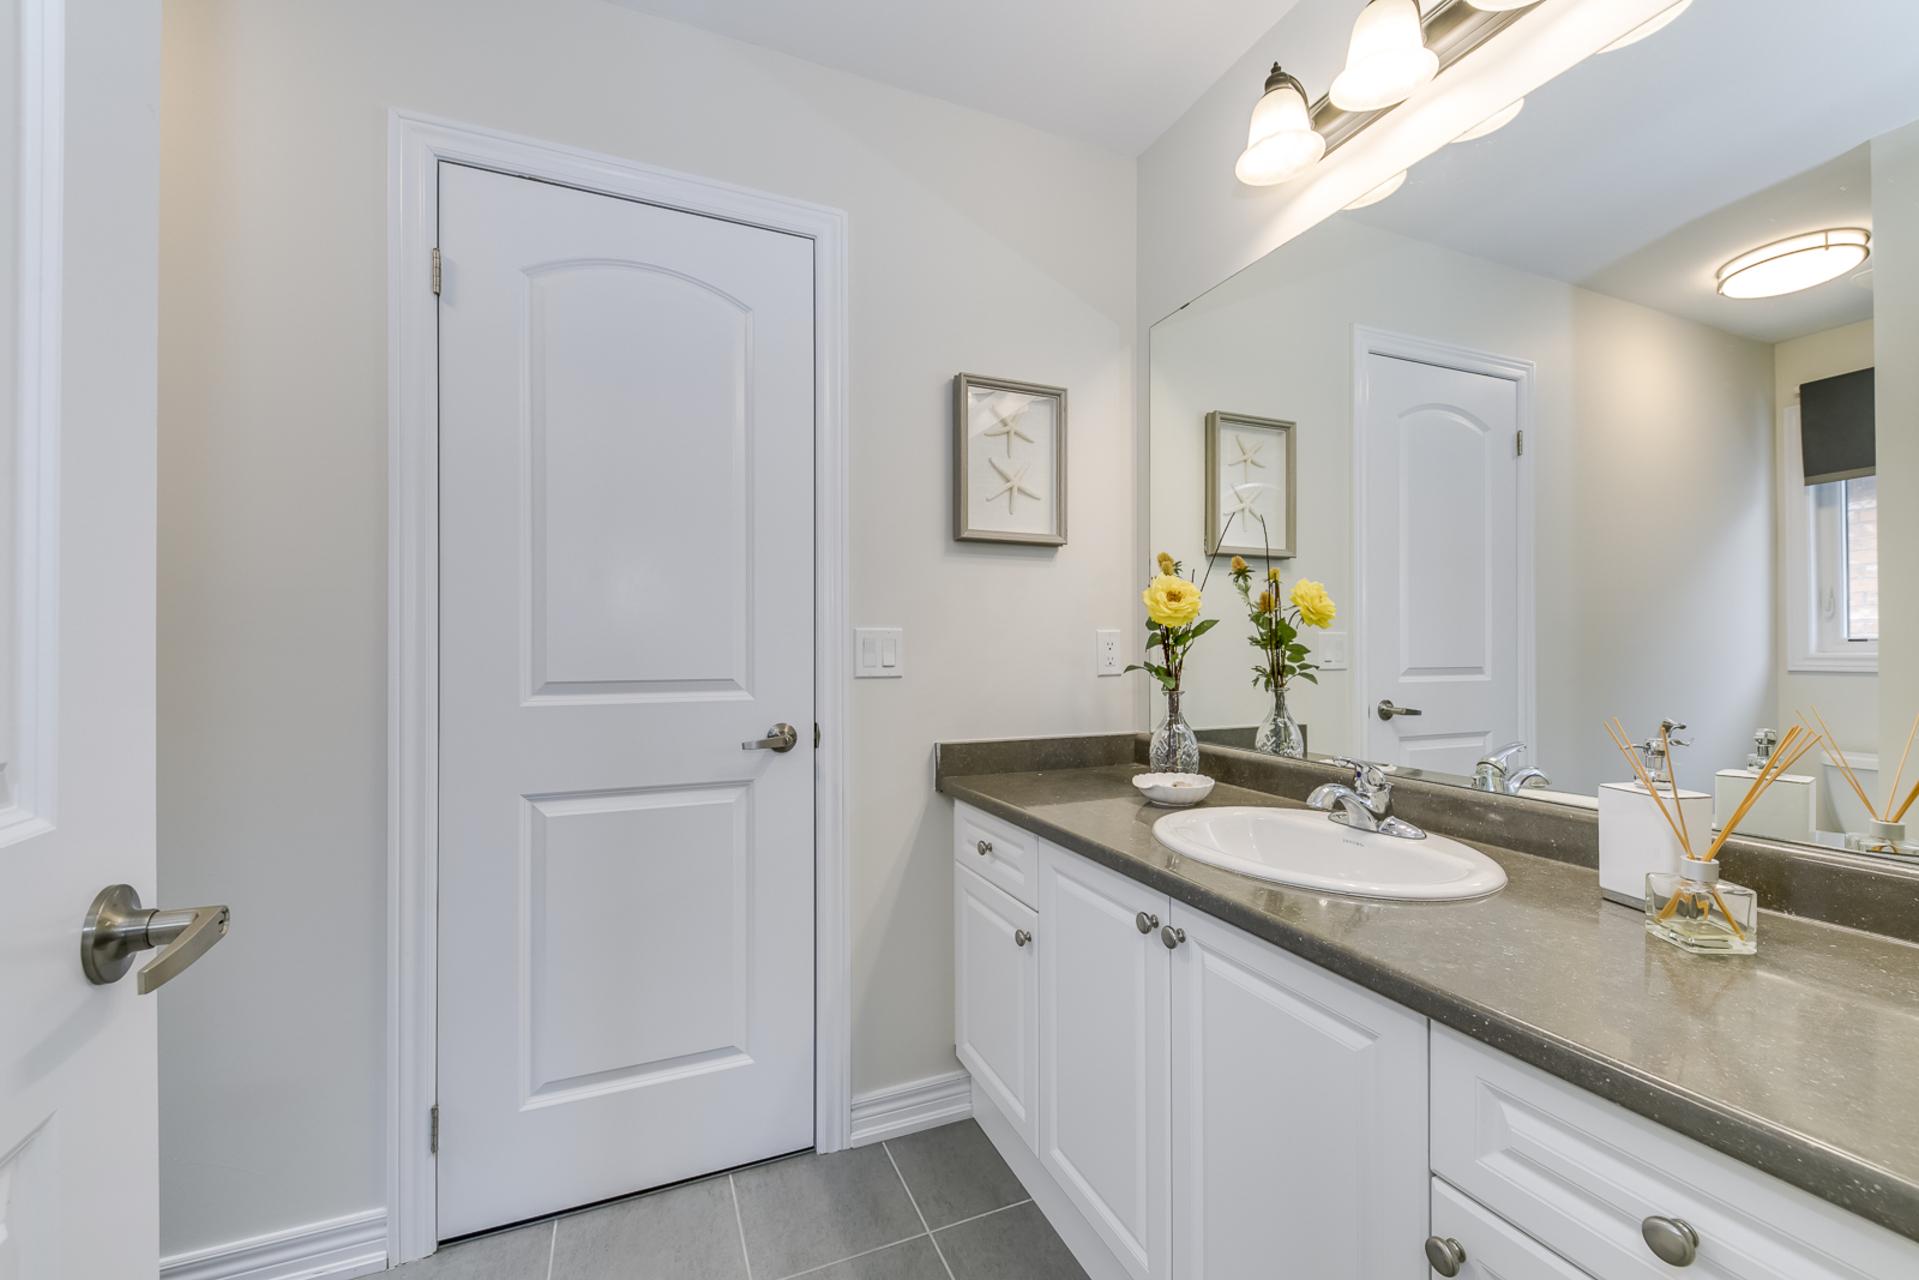 Jack & Jill Bathroom - 31 Beacon Point St,  Markham - Elite3 & Team at 31 Beacon Point Street, Wismer, Markham